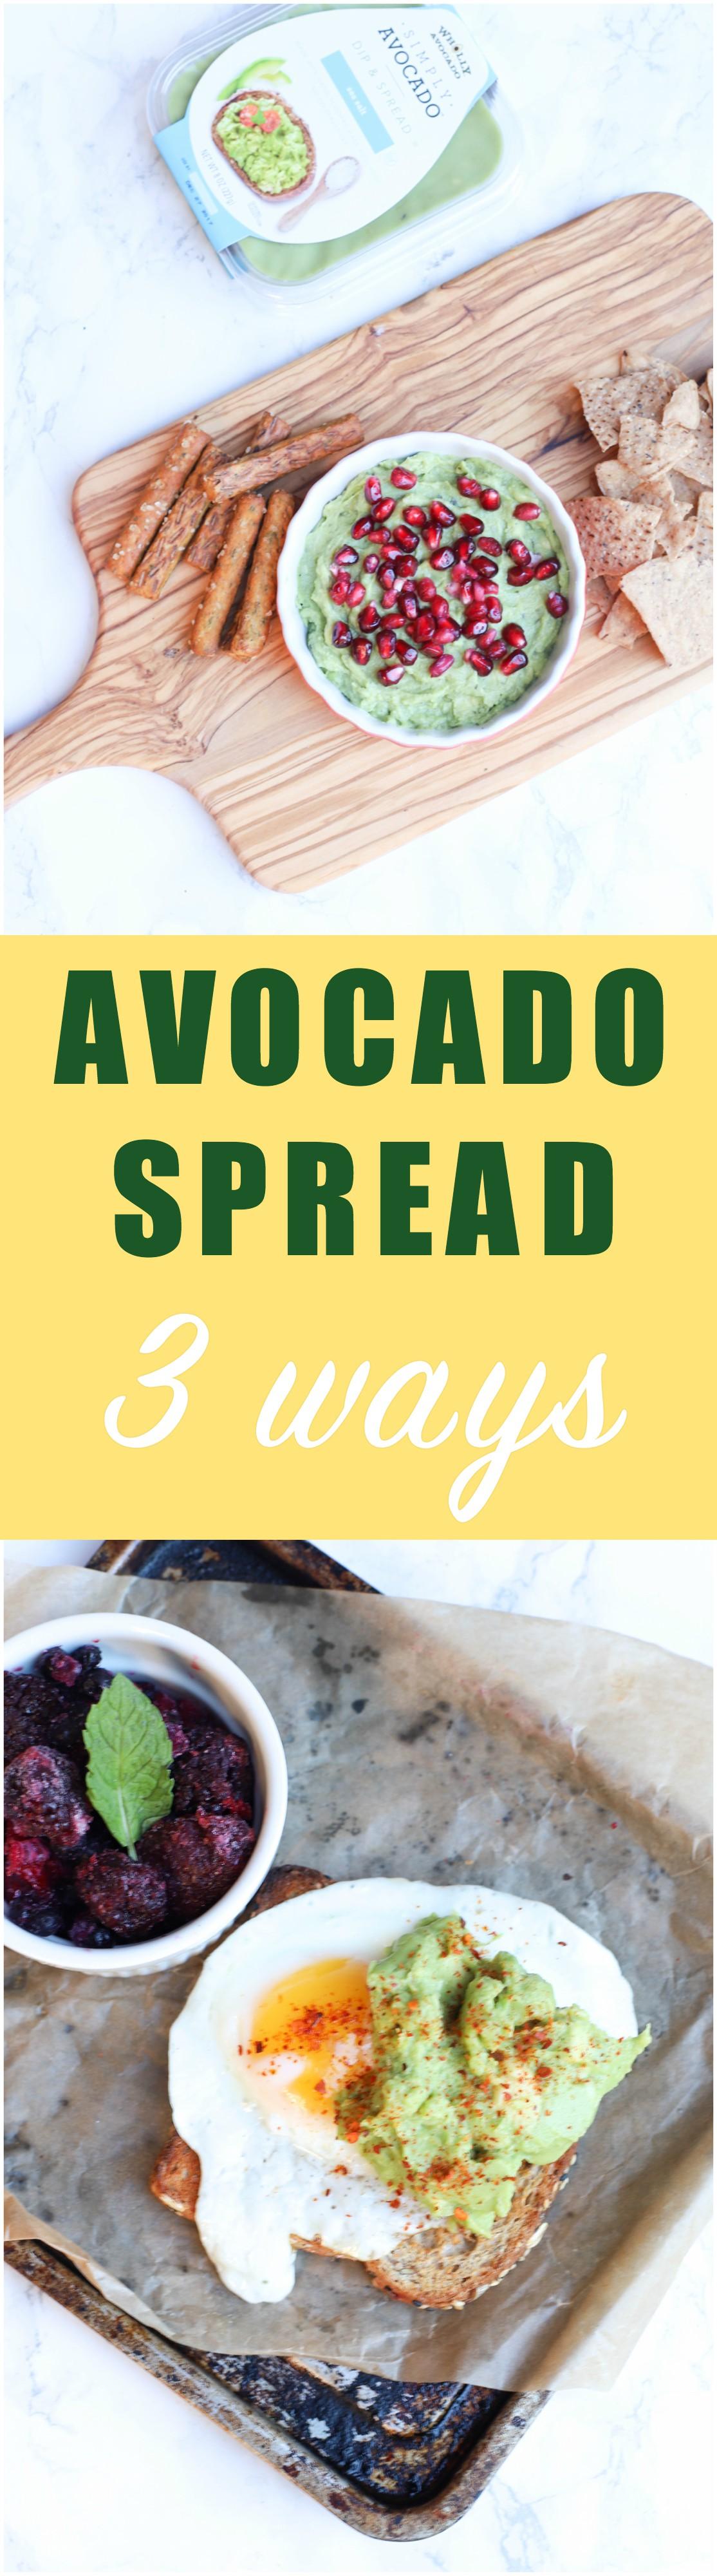 Enjoy Avocado Spread 3 Ways for parties, snacks, and utilizing leftover.